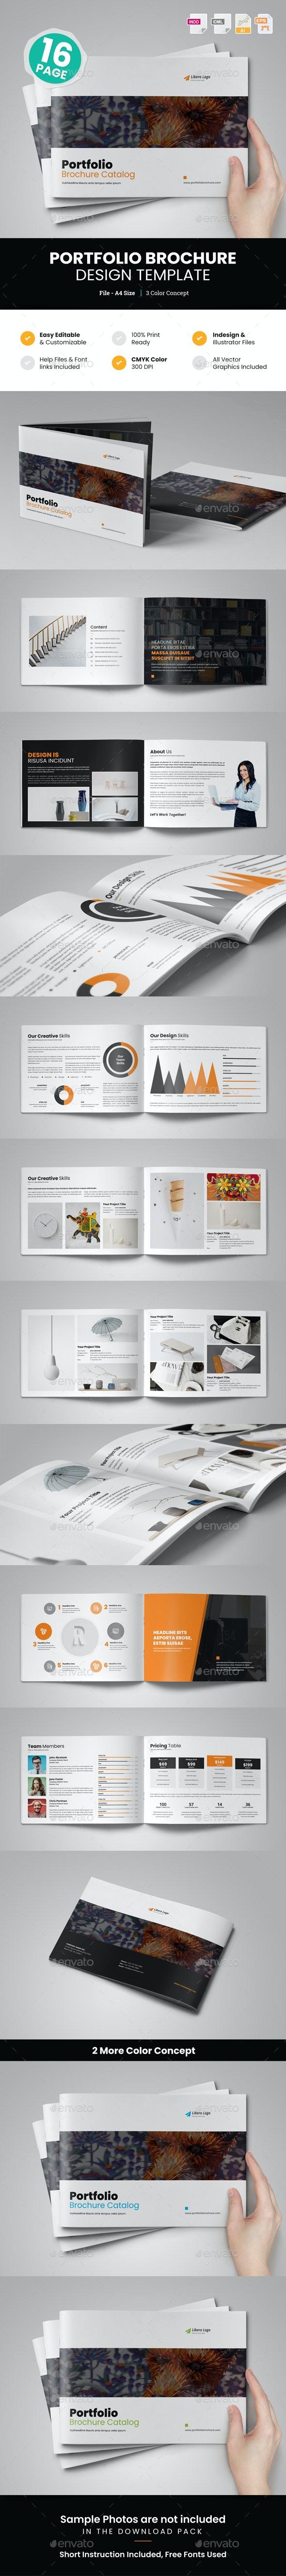 Portfolio Brochure Design v2 - Corporate Brochures